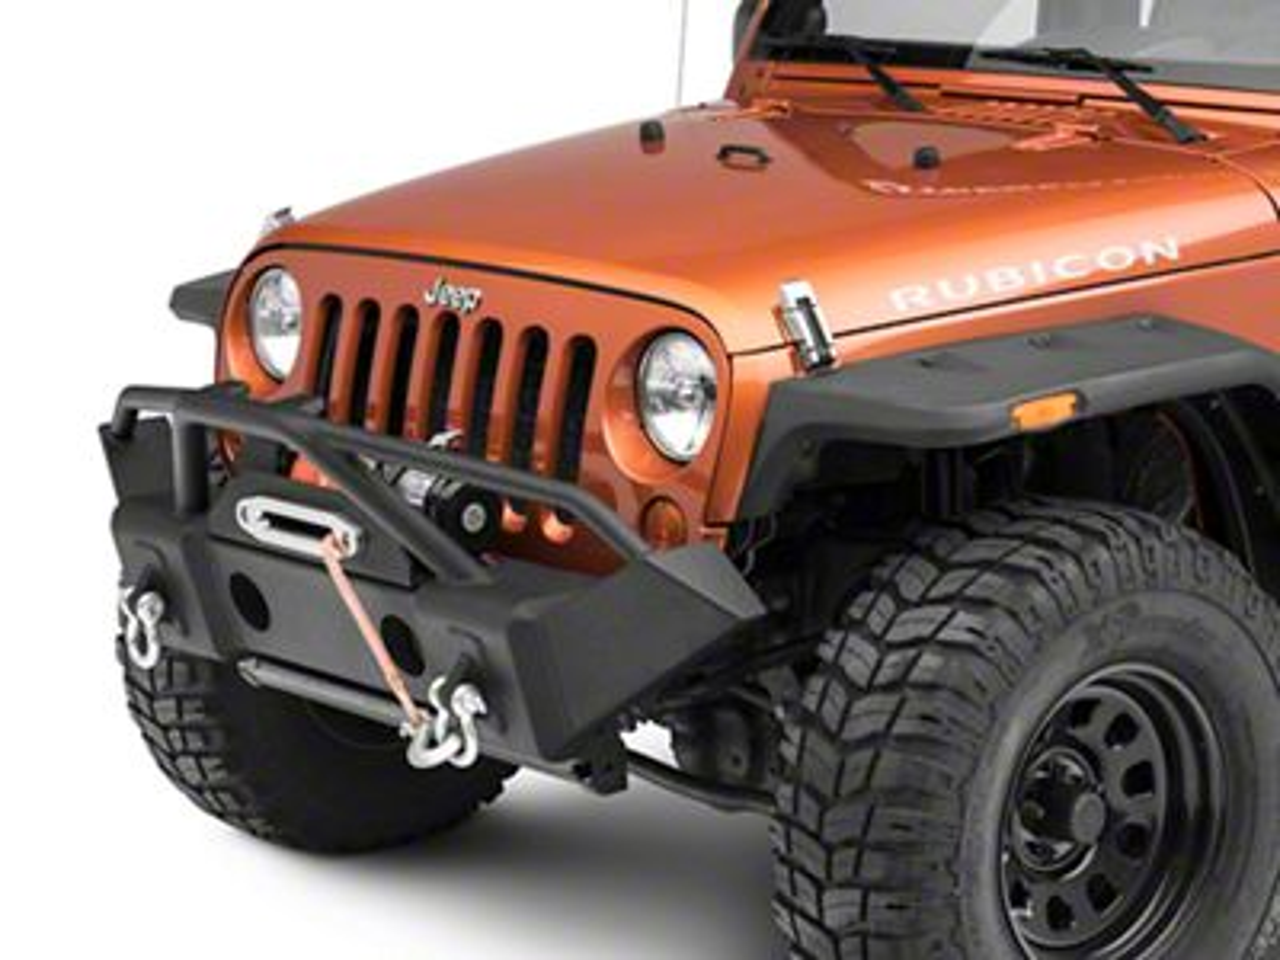 RedRock 4x4 Avenger Front Bumper w/ Winch Mount (07-18 Jeep Wrangler JK)